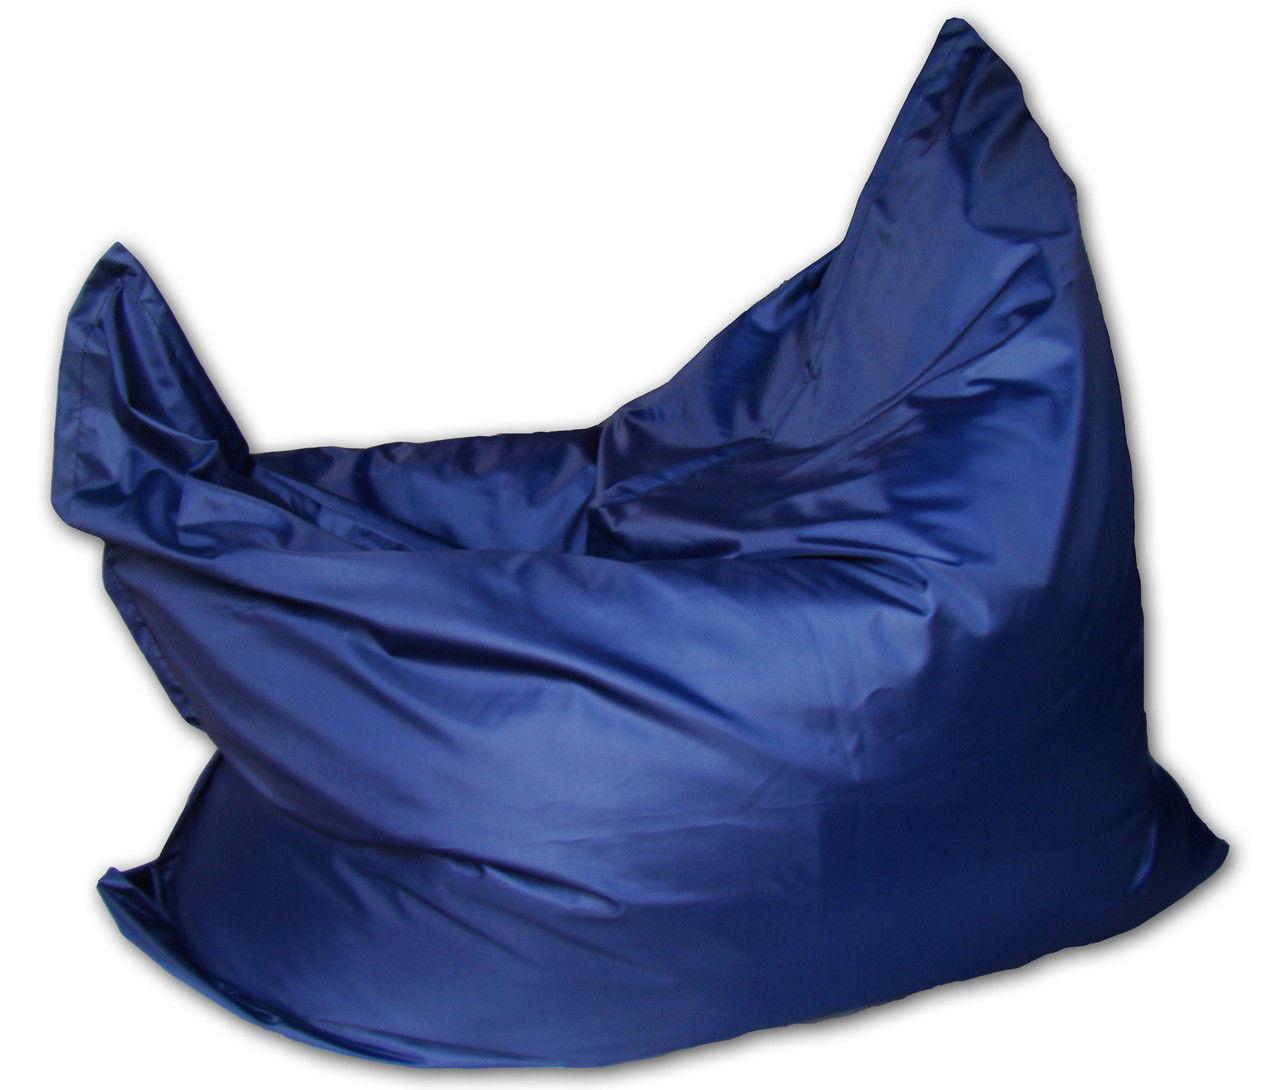 Синее кресло мешок подушка 120*140 см из ткани Оксфорд, кресло-мат, фото 2 СИНЕЕ КРЕСЛО МЕШОК ПОДУШКА 120*14